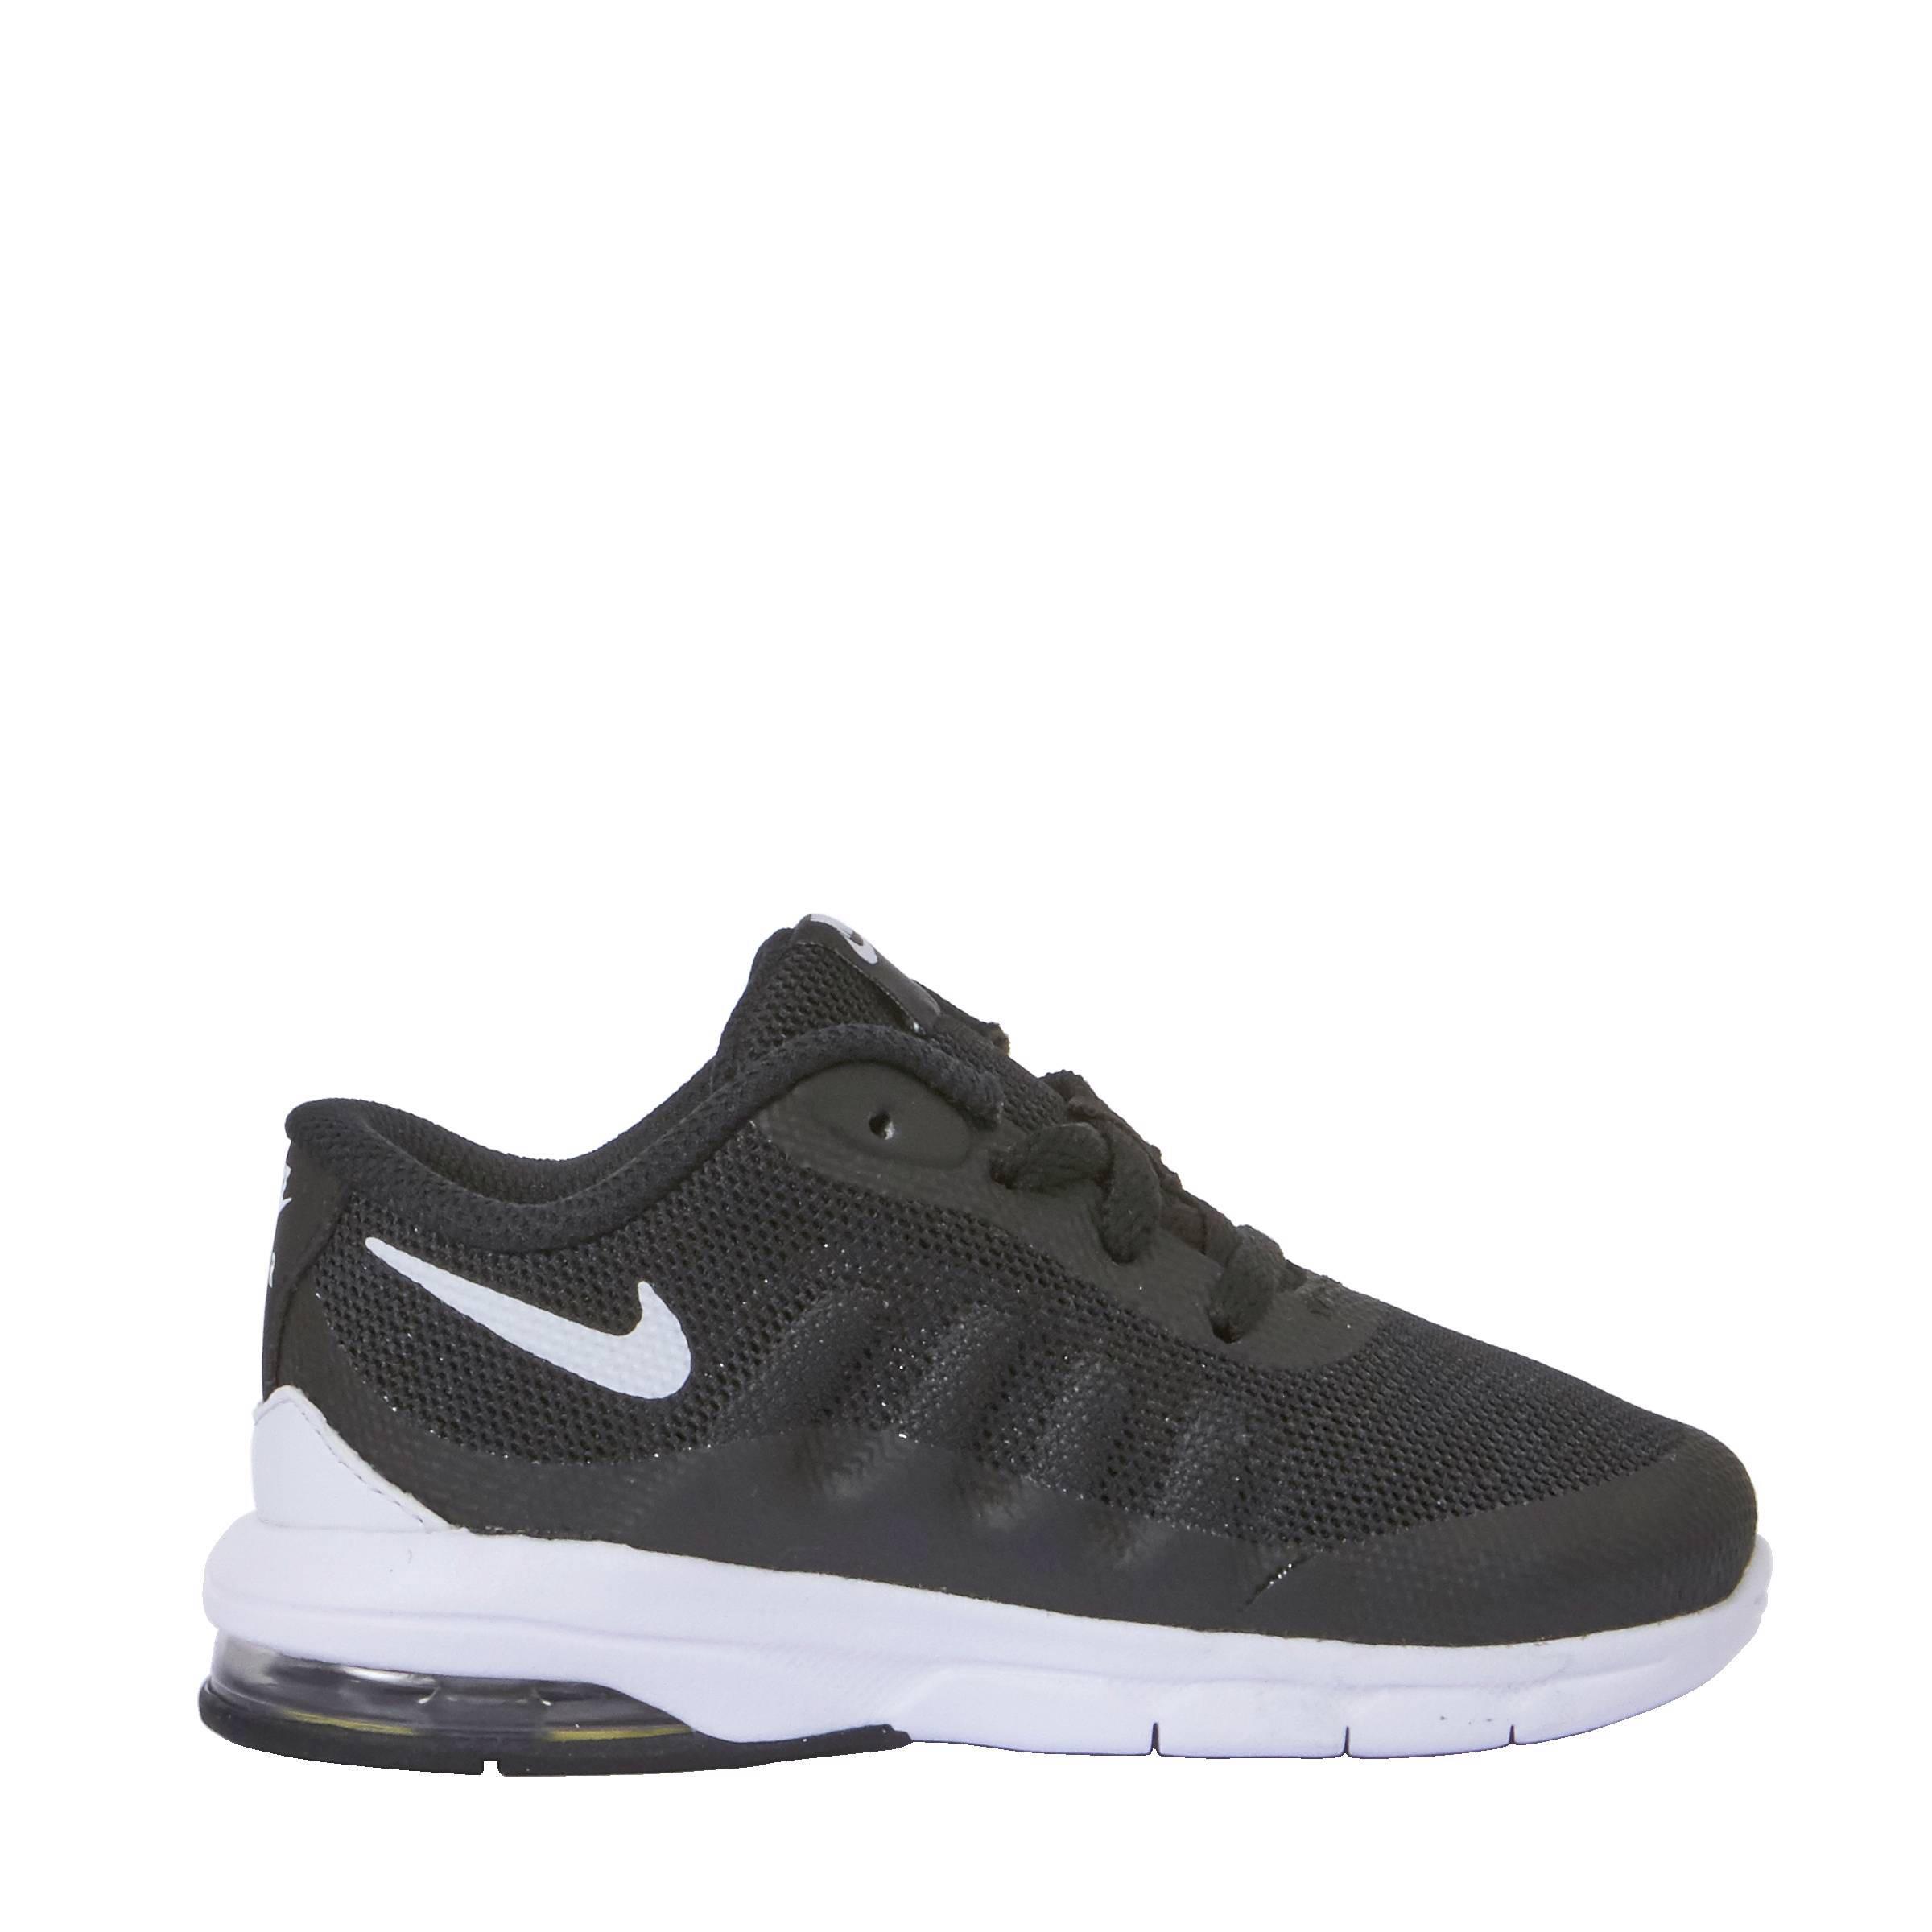 Sneakers Nike Air Max Invigor (Td) by Nike